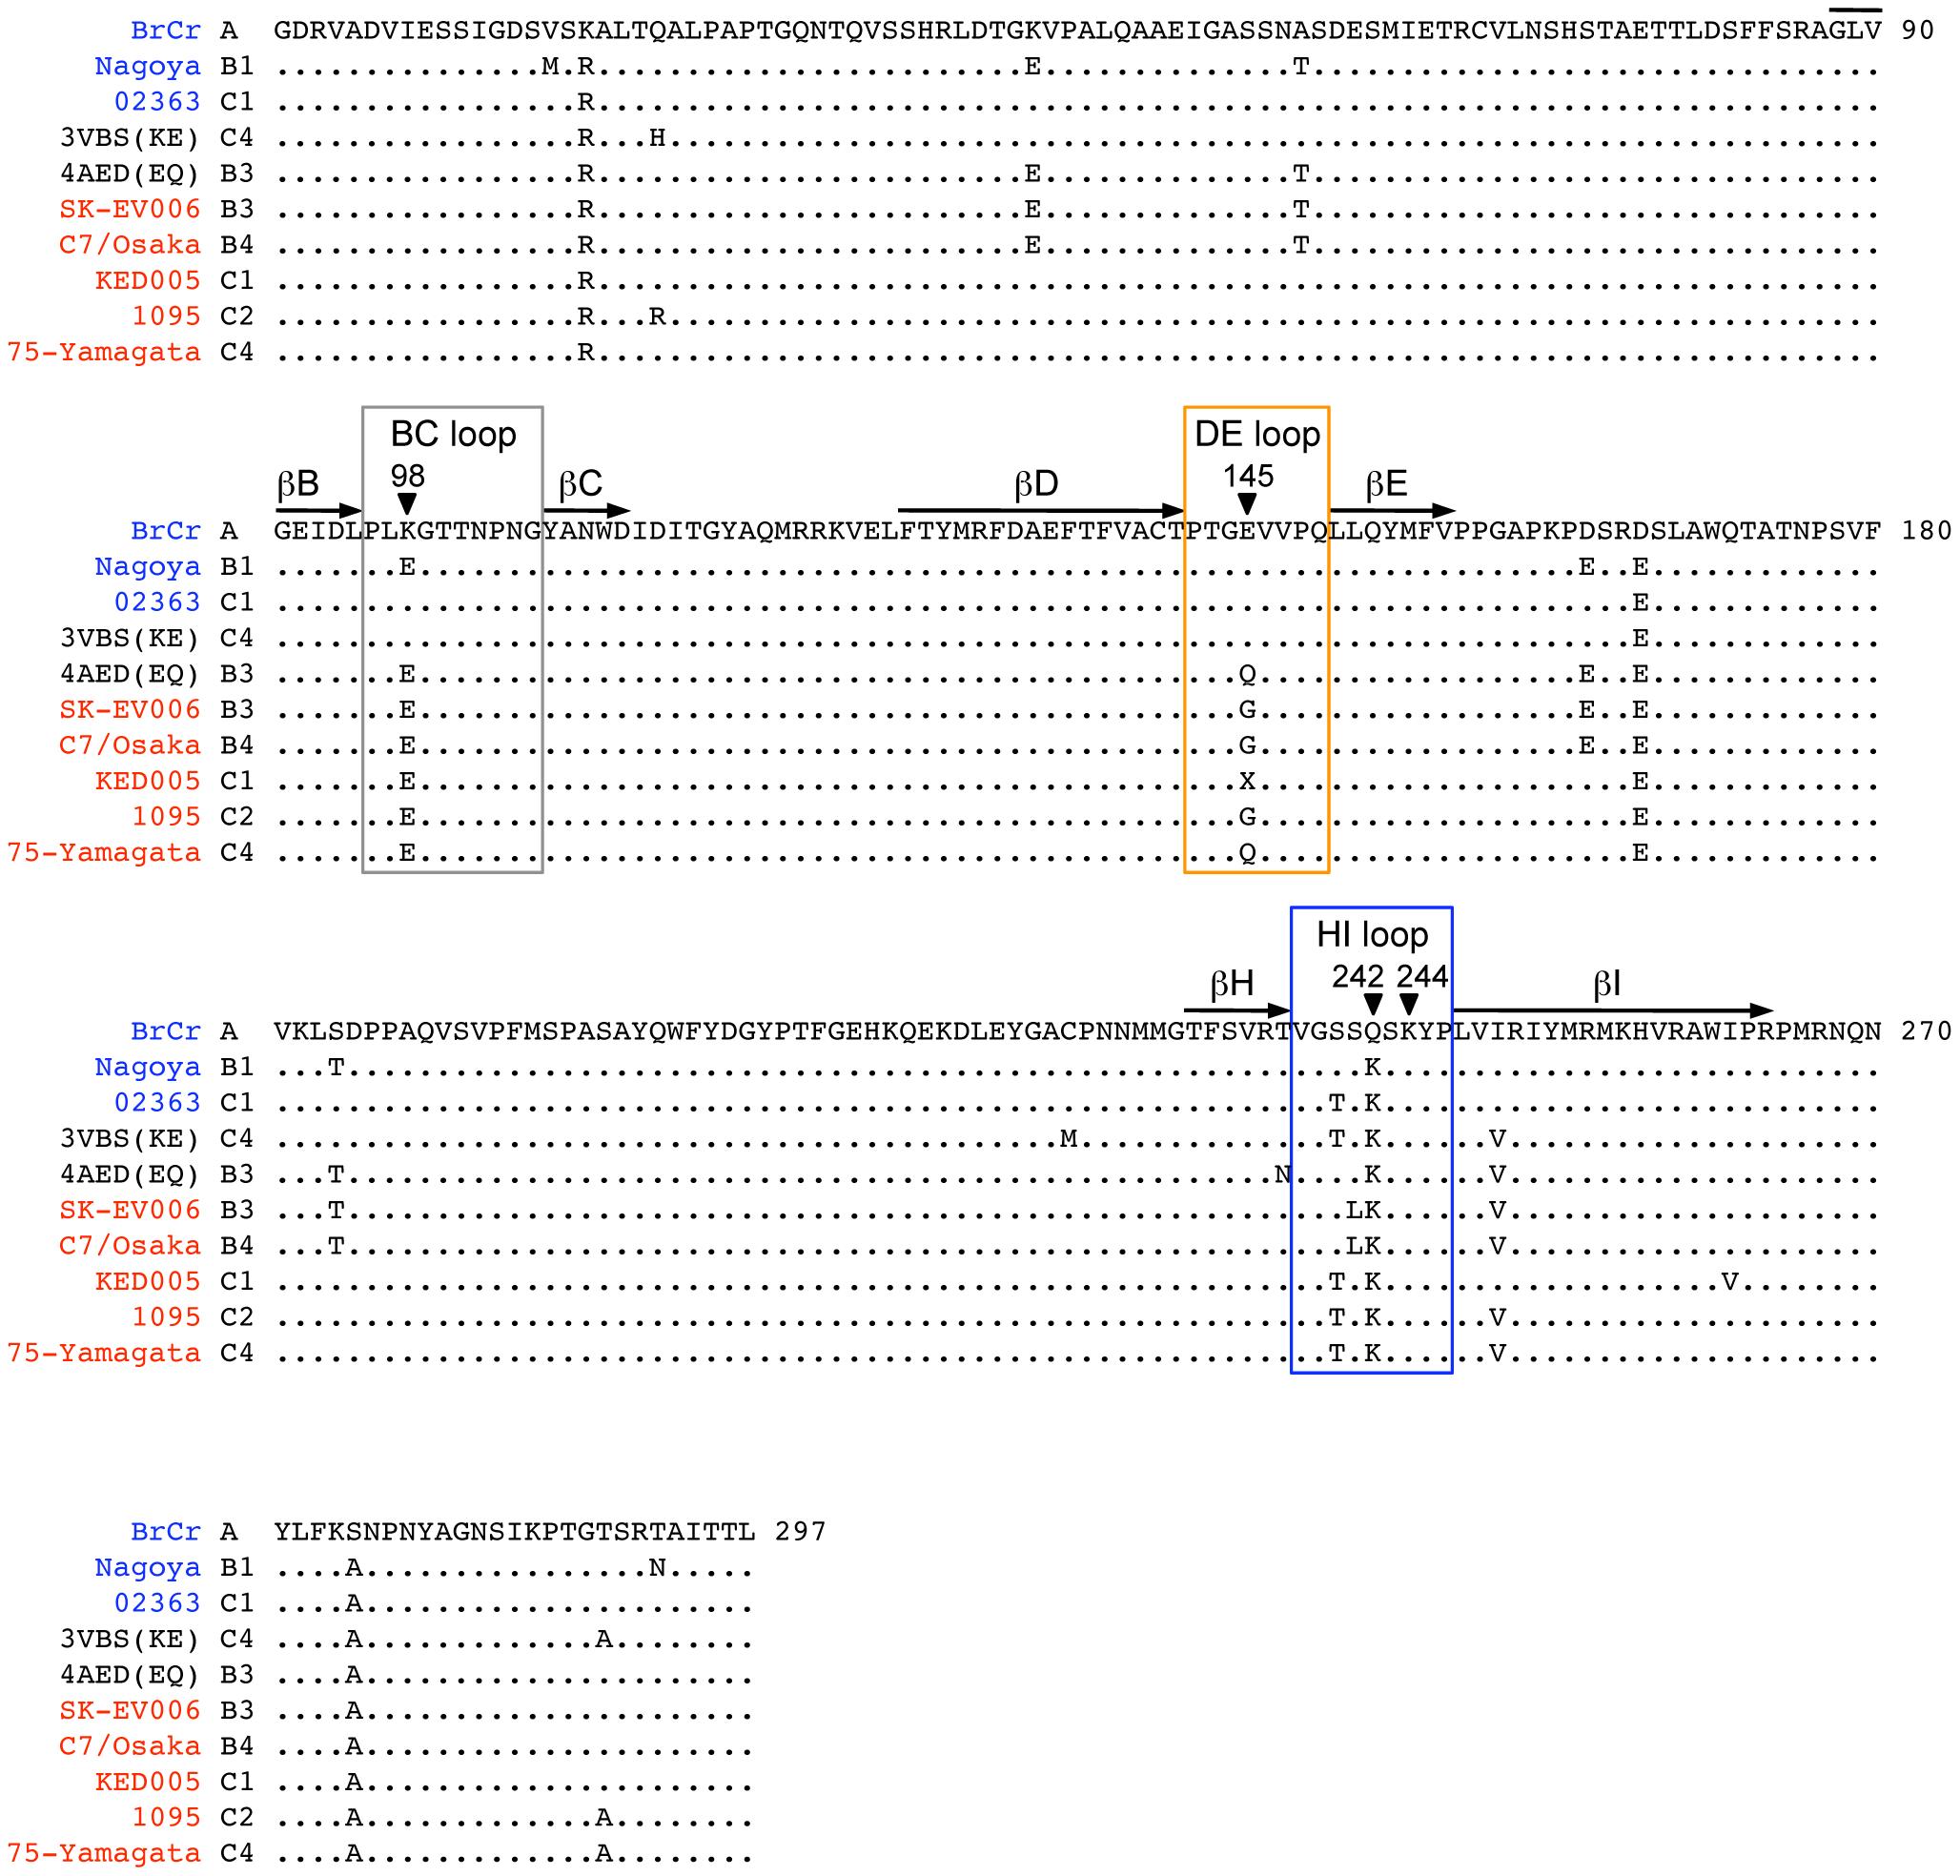 Alignment of EV71 VP1 sequences.